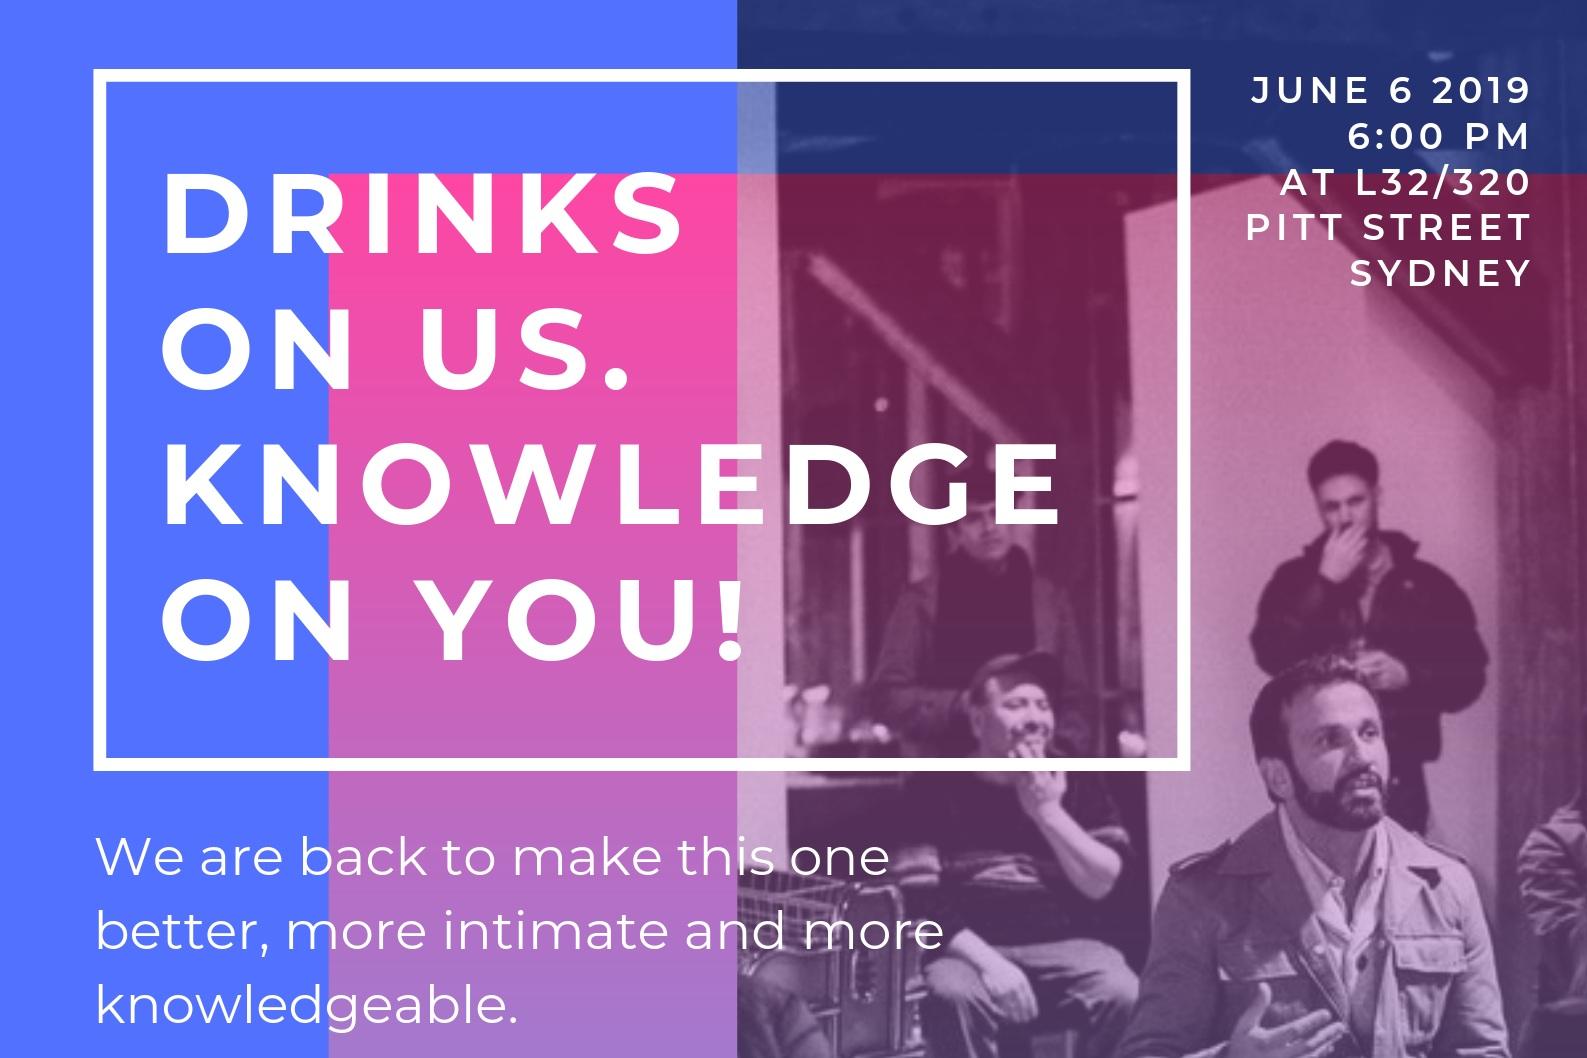 06 JUNE 2019 - THURSDAY - 6:00pm - 7:30pmLevel 32, 320 Pitt Street Sydney NSW 2000